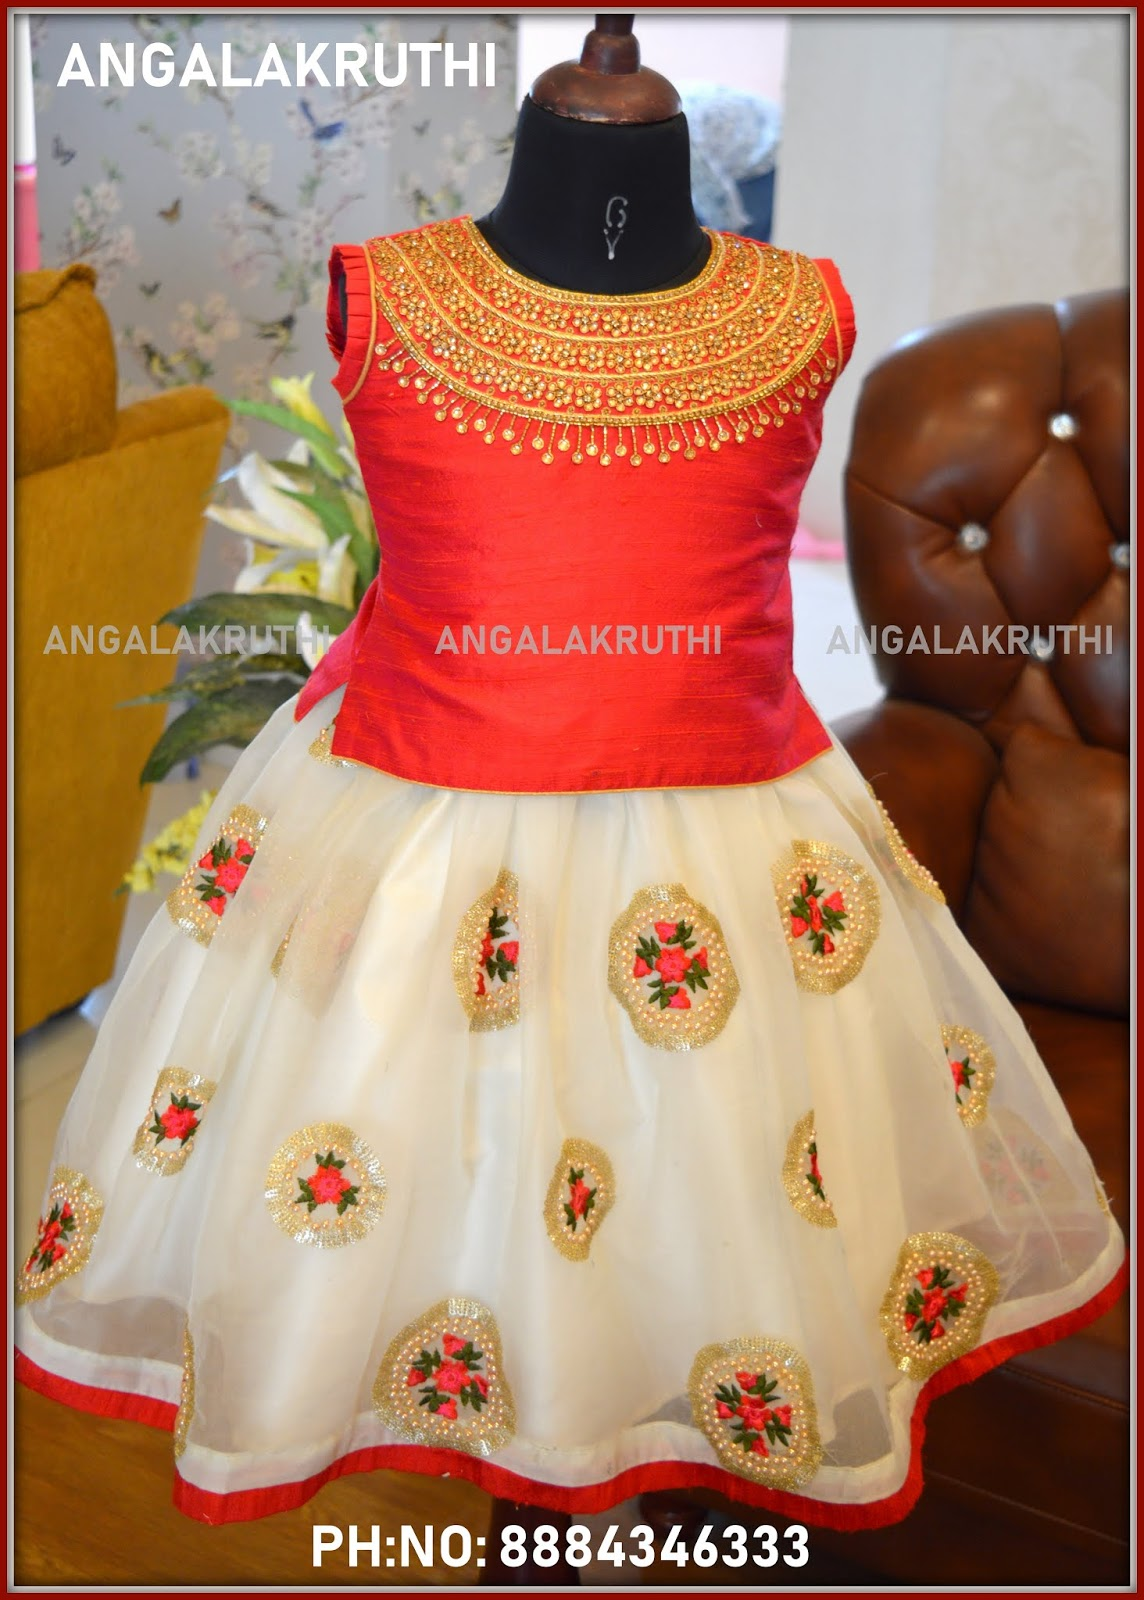 759098237a8 Custom designer boutique in Bangalore for ladies and kids -ANGALAKRUTHI  BOUTIQUE IN BANGALORE